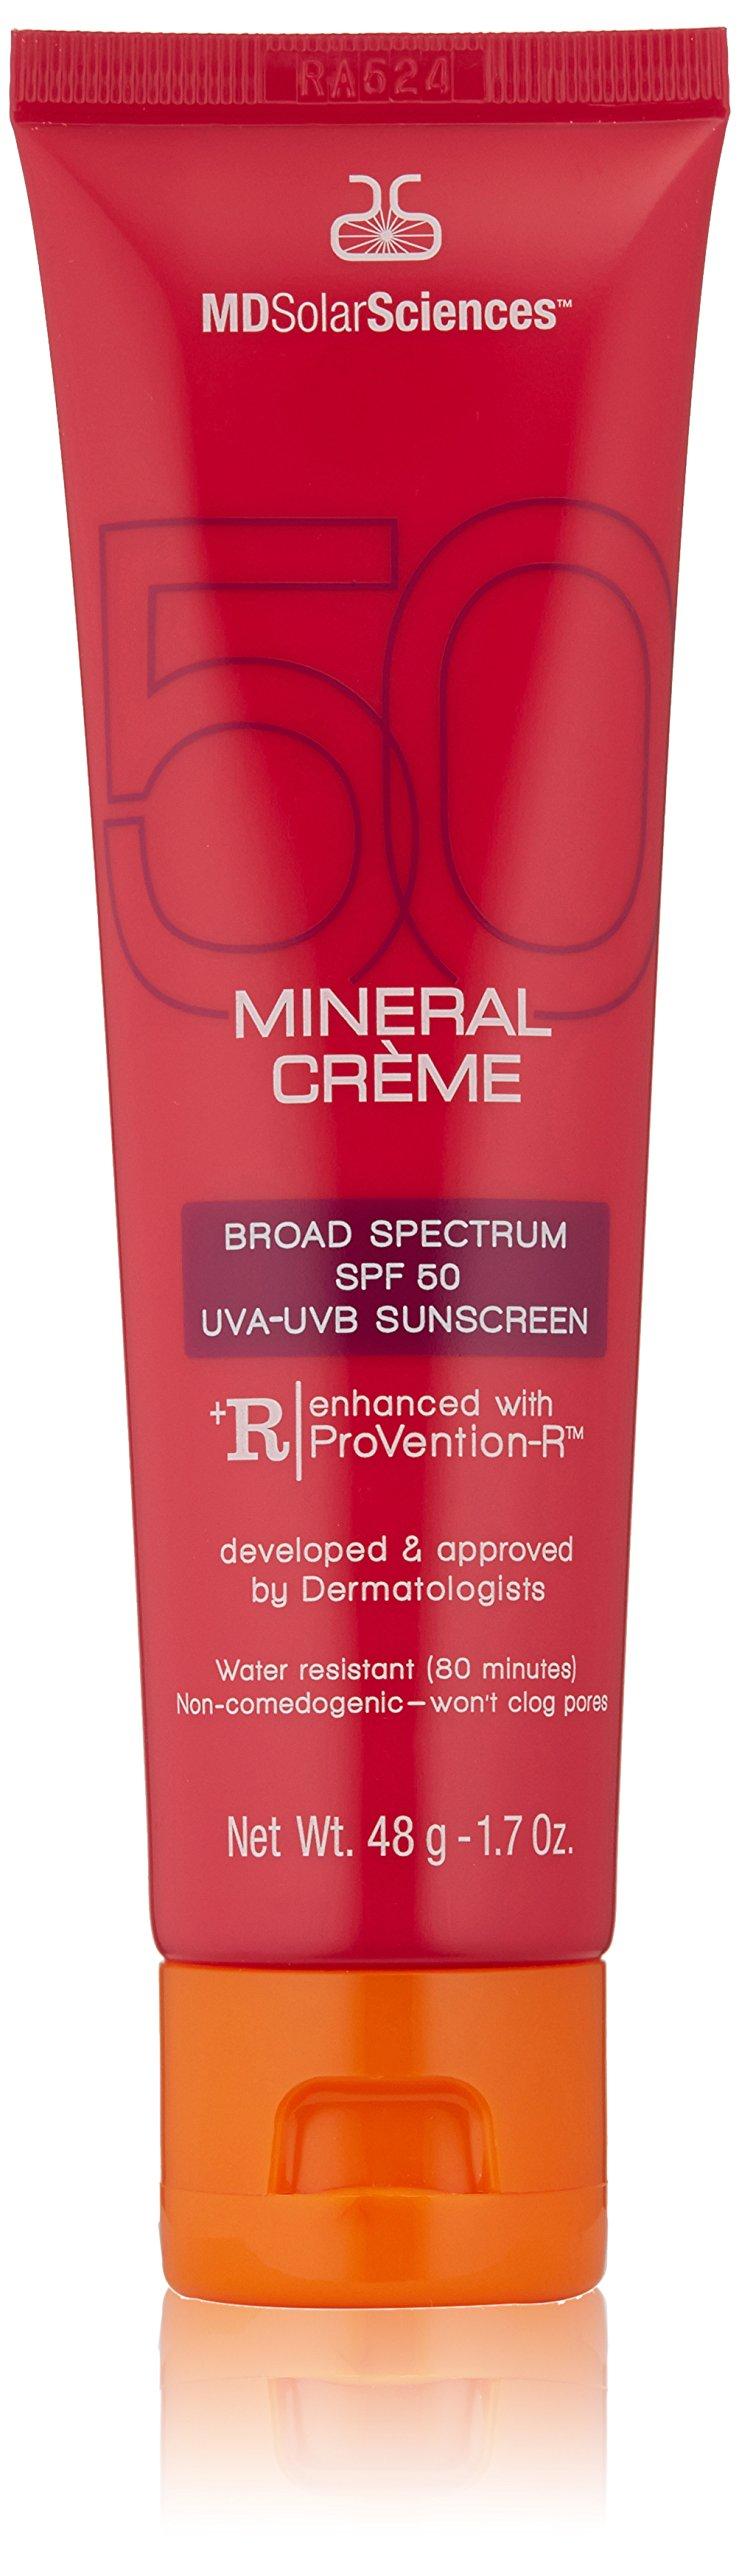 MDSolarSciences Mineral Crème Broad Spectrum SPF 50 by MDSolarSciences